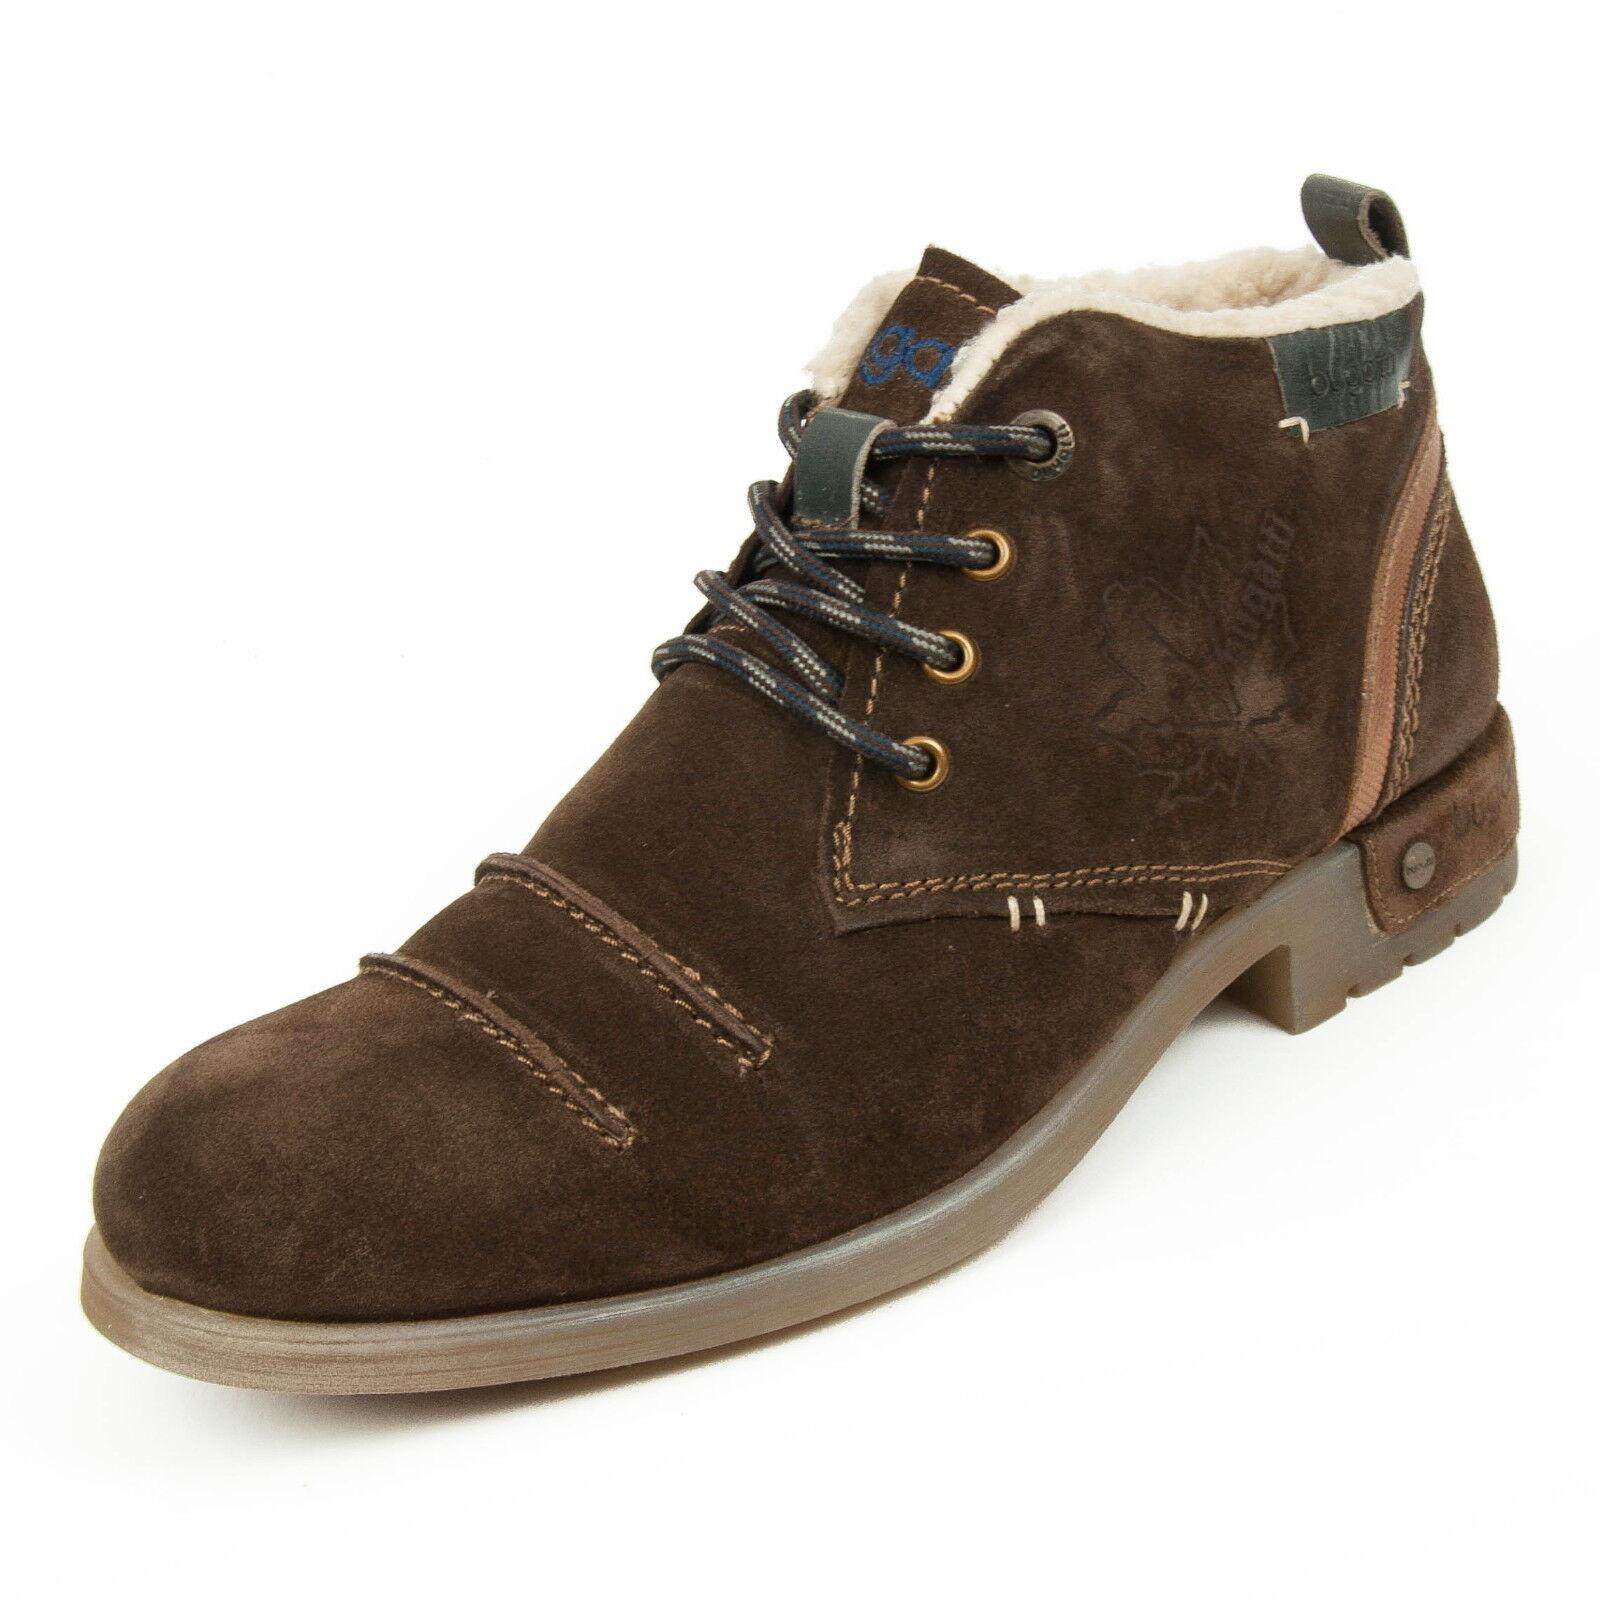 Bugatti caballero zapatos cuero schnürbotas botines marrón k3258-3-600